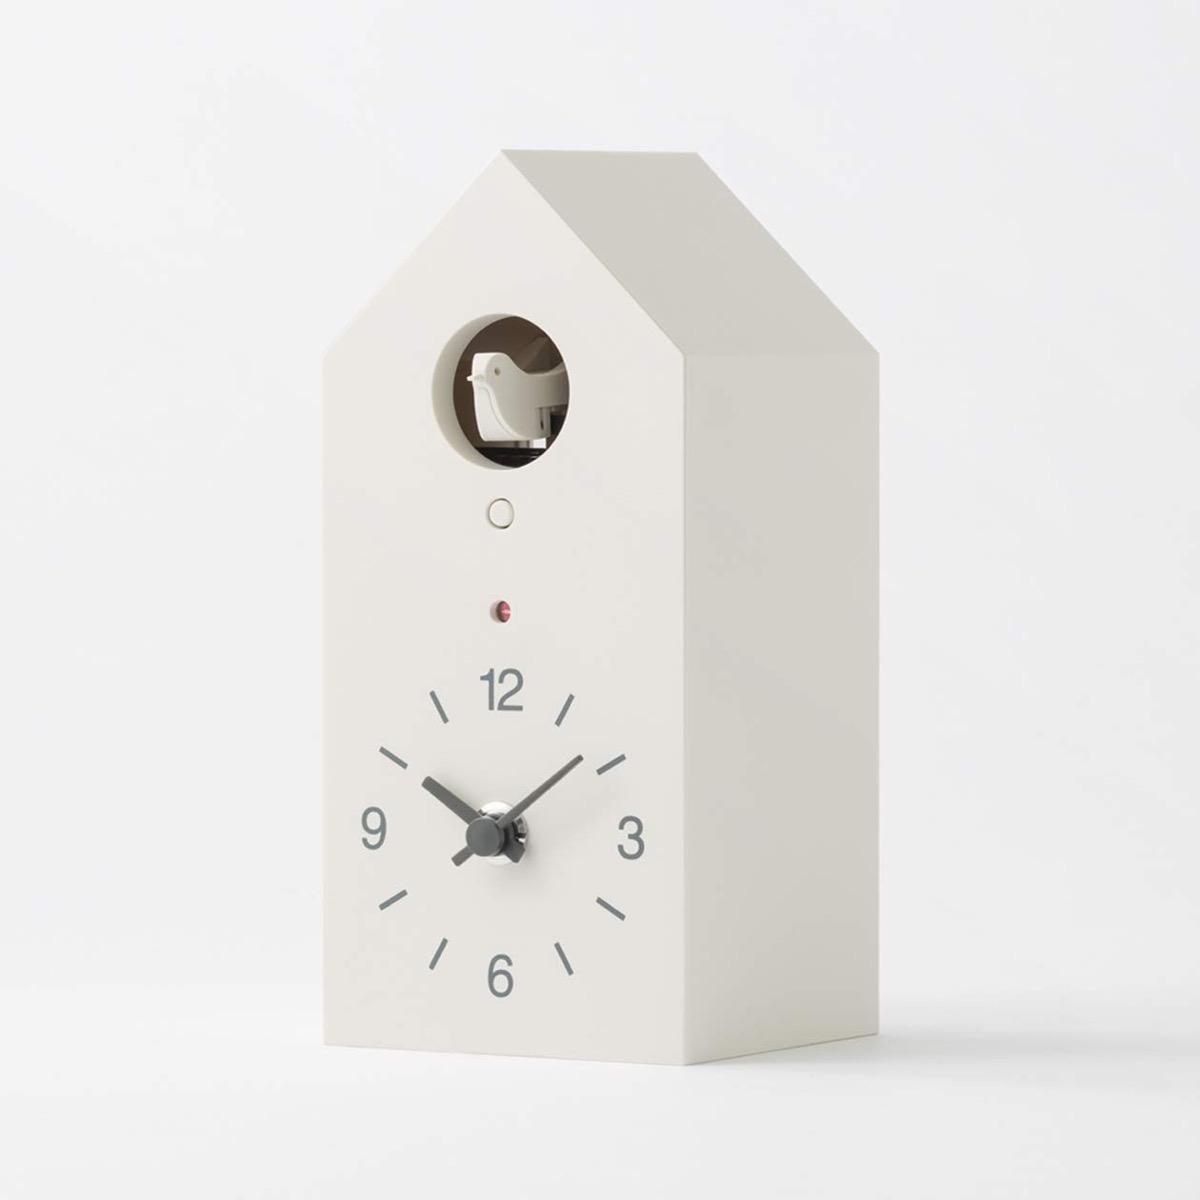 minimalist-modern-cuckoo-clock-designer-fun-gifts-for-an-architect